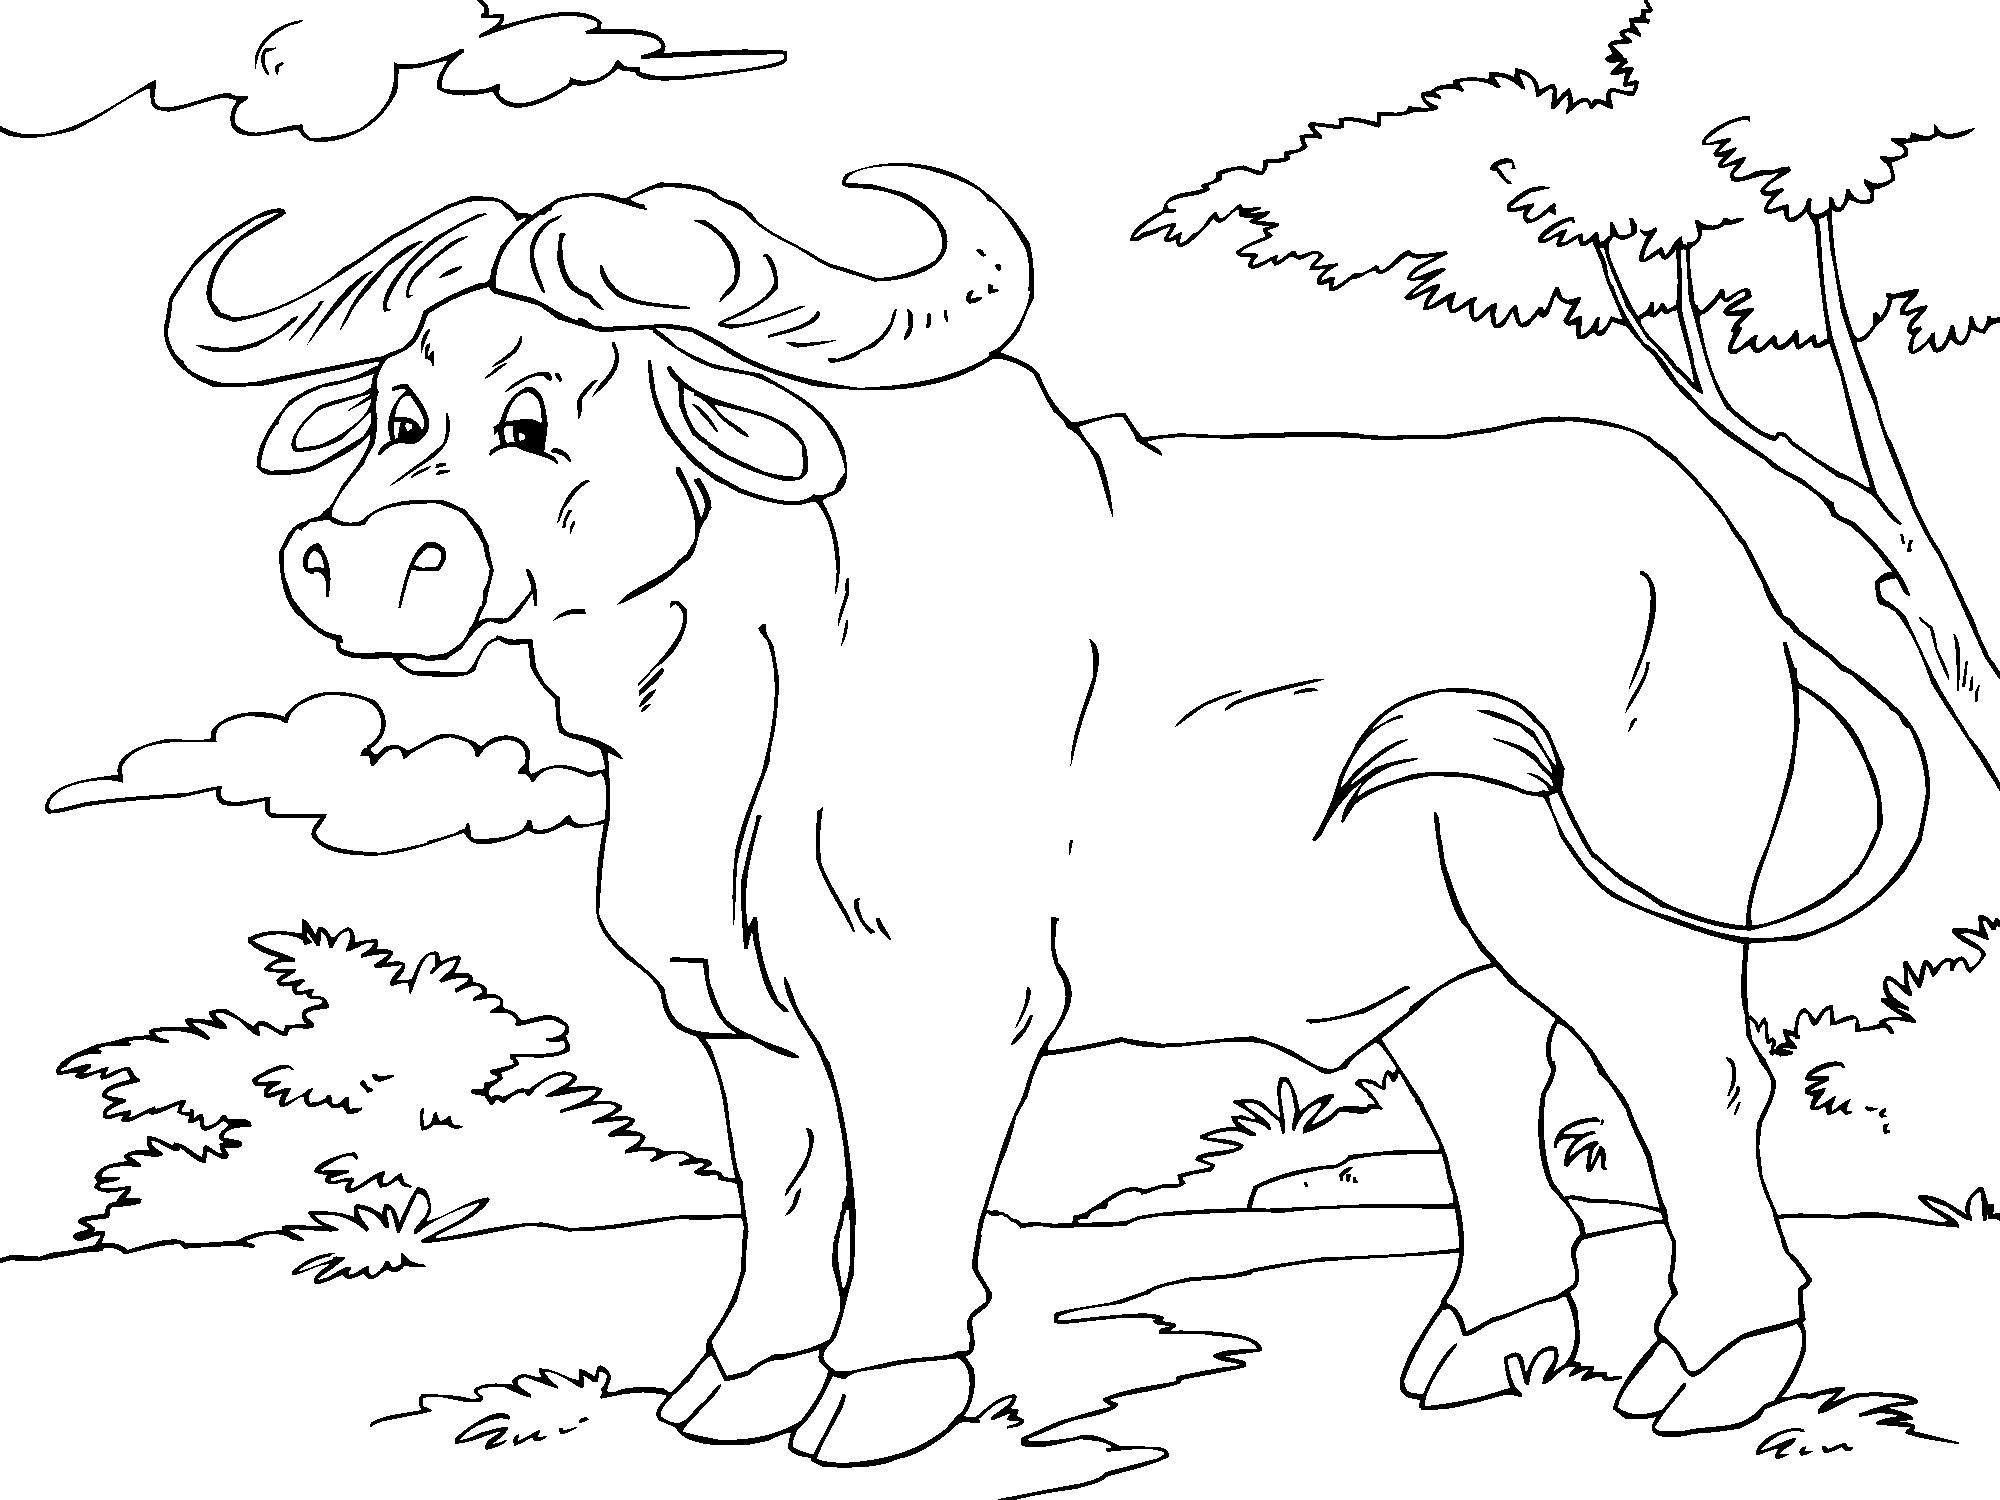 Asombroso Búfalo Para Colorear Imprimible Bandera - Dibujos Para ...